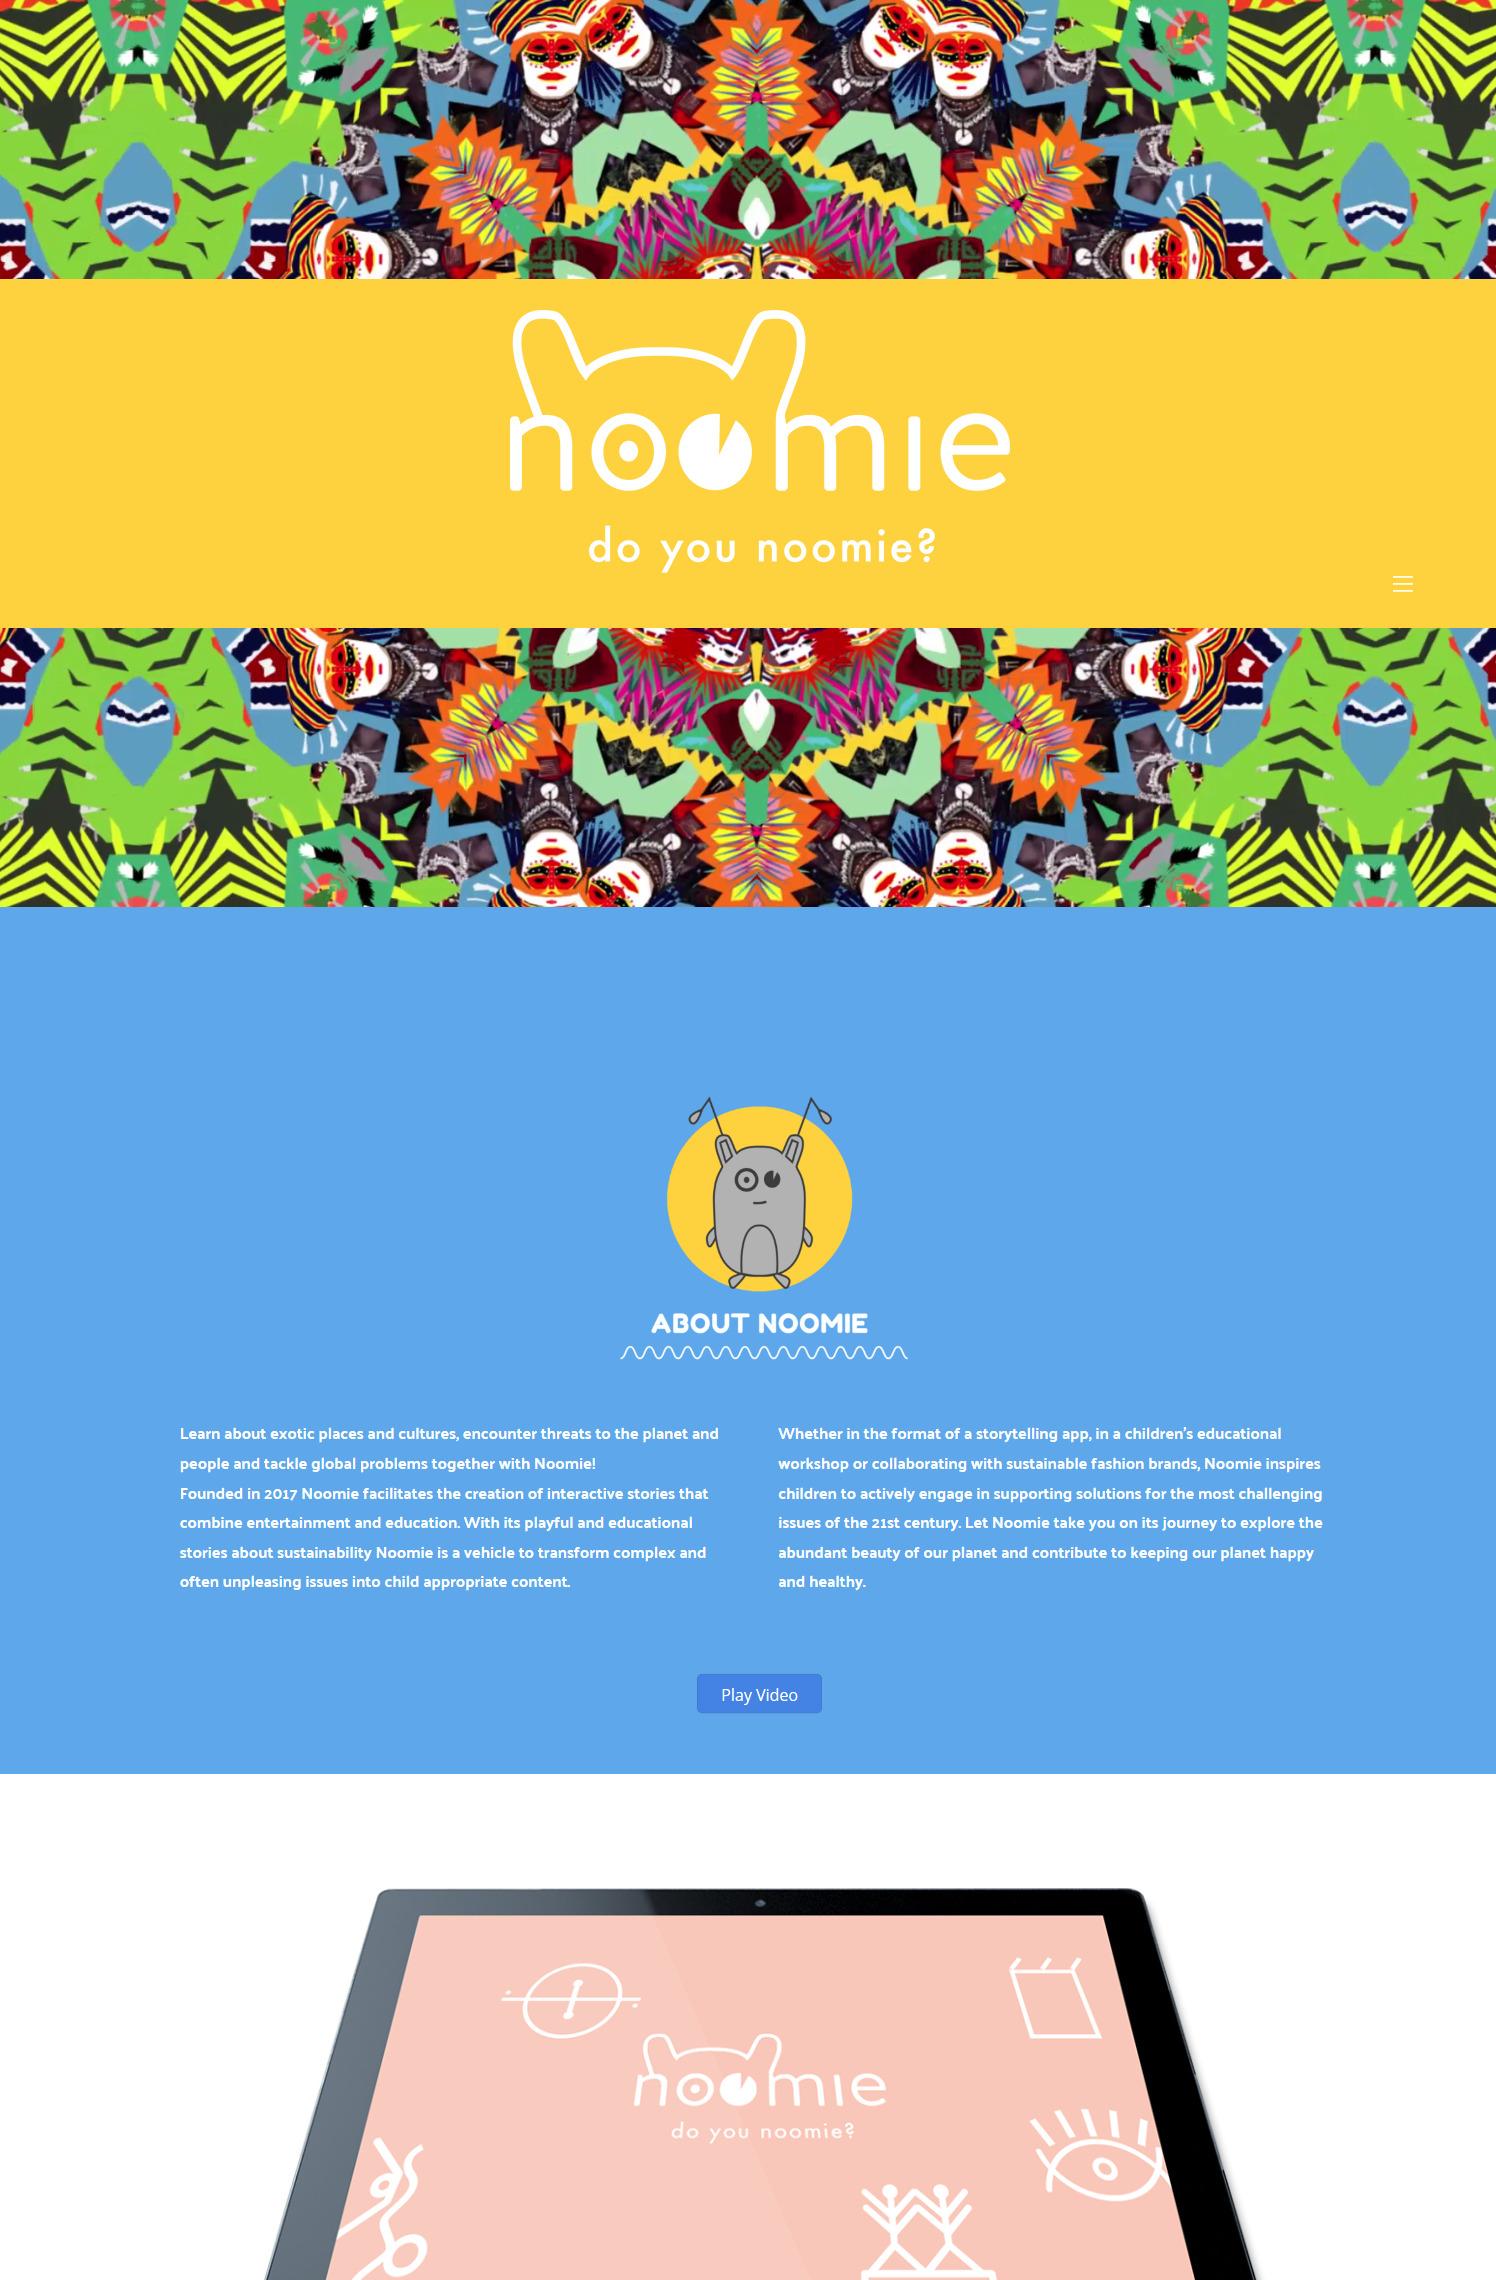 Noomie – Raise awareness, inspire and create impact